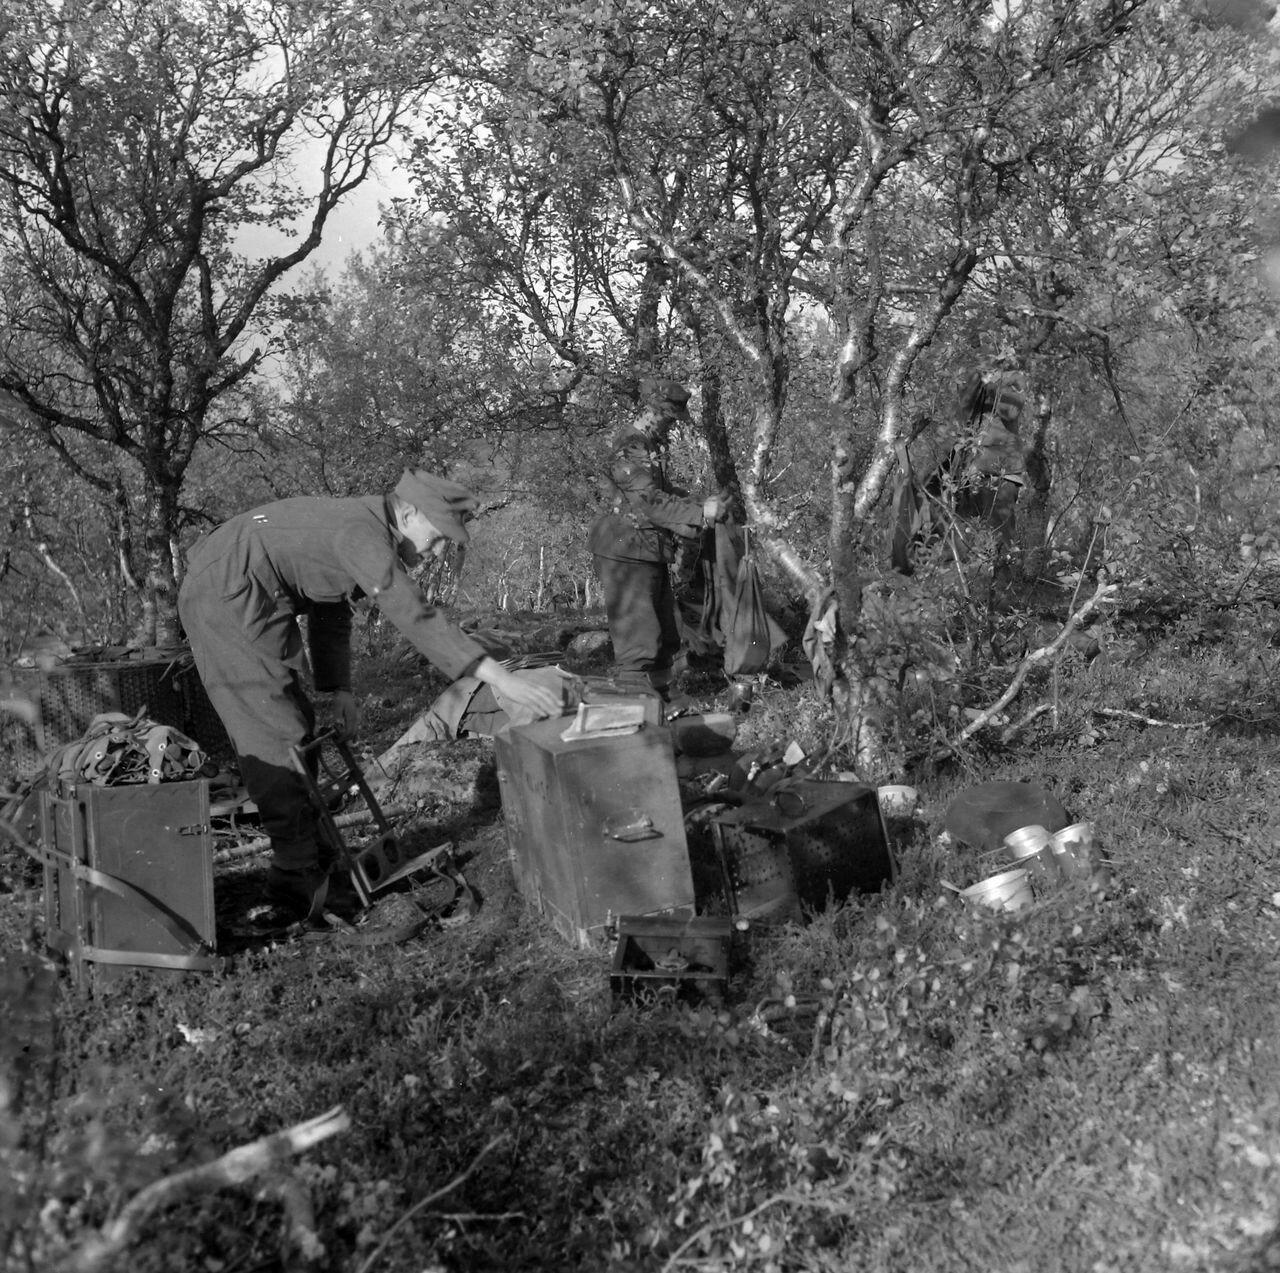 Два солдата распределяют багаж